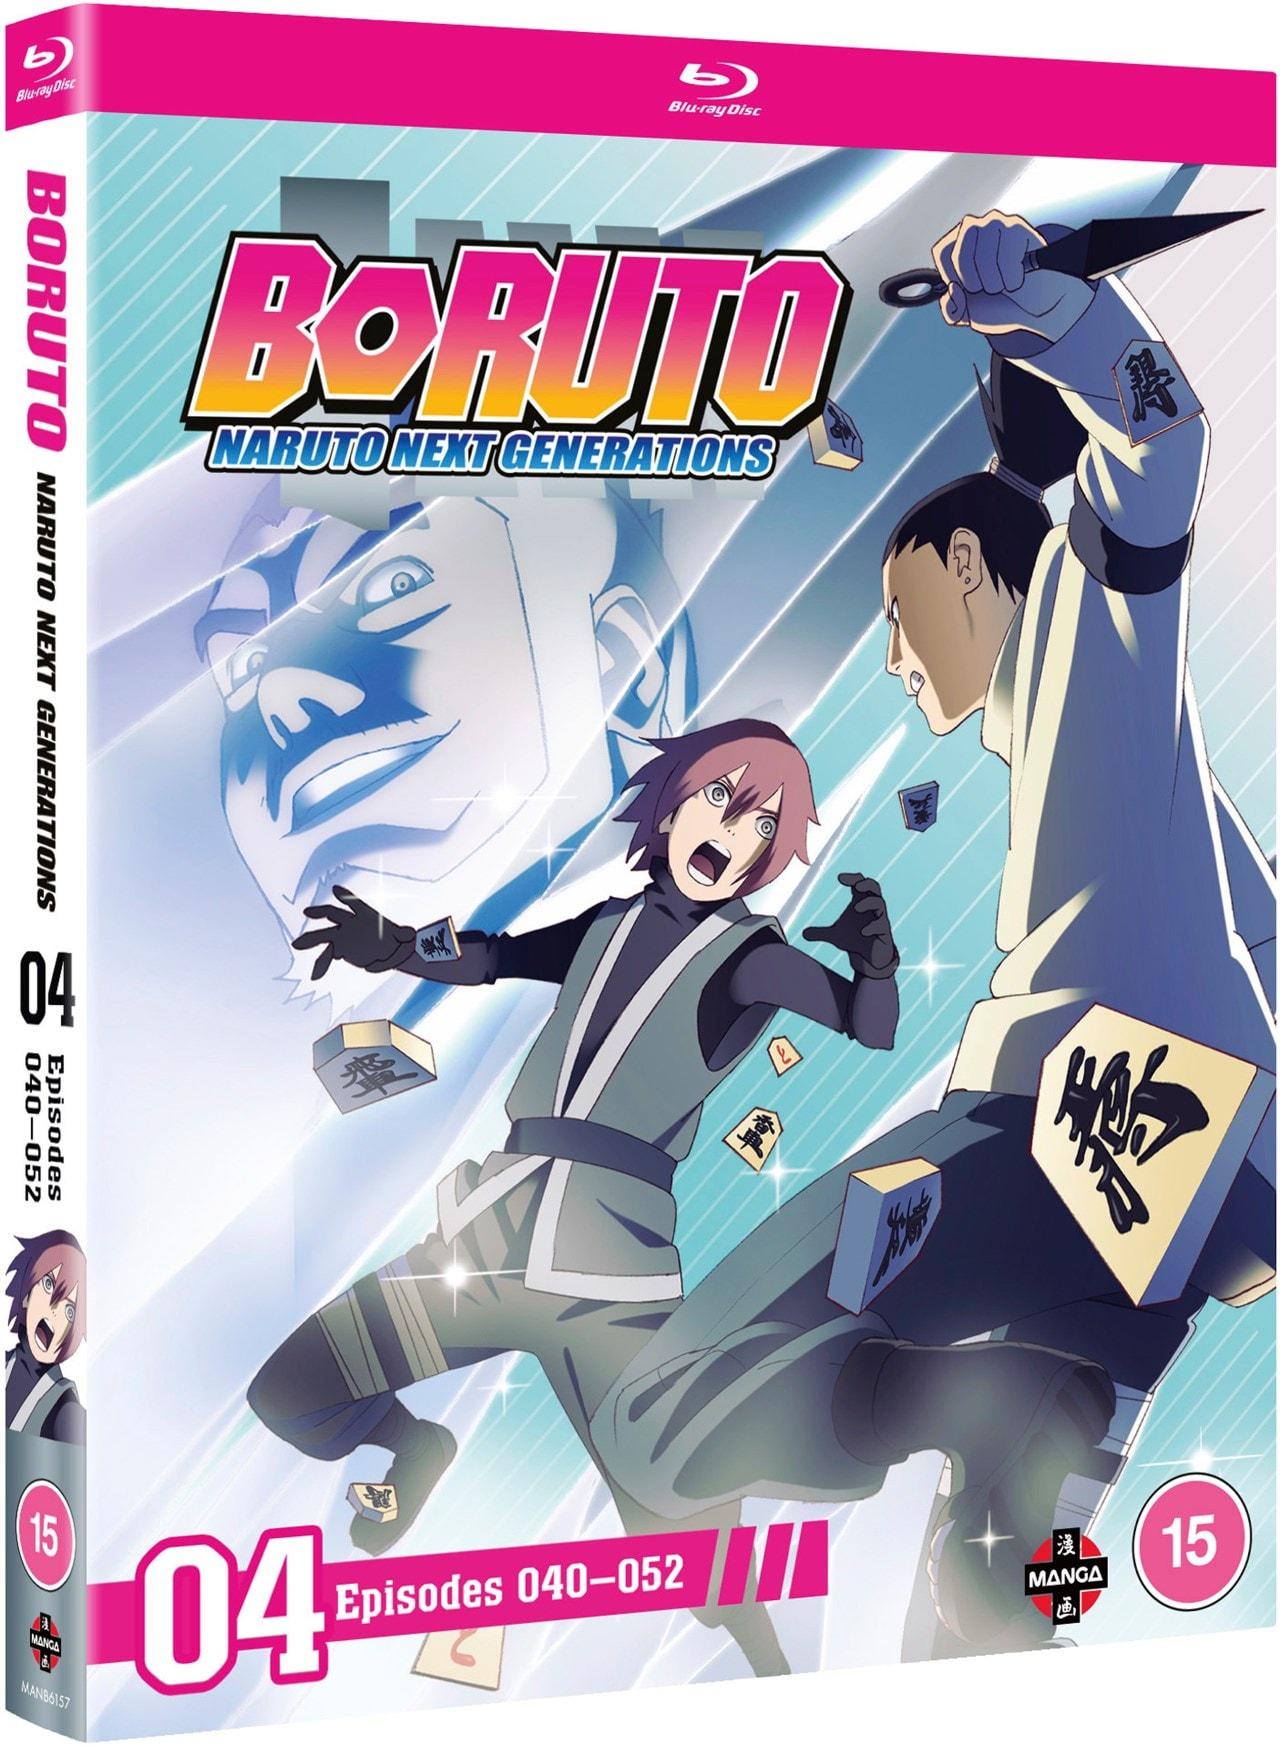 Boruto Naruto Next Generations Set 4 Blu Ray Free Shipping Over 20 Hmv Store